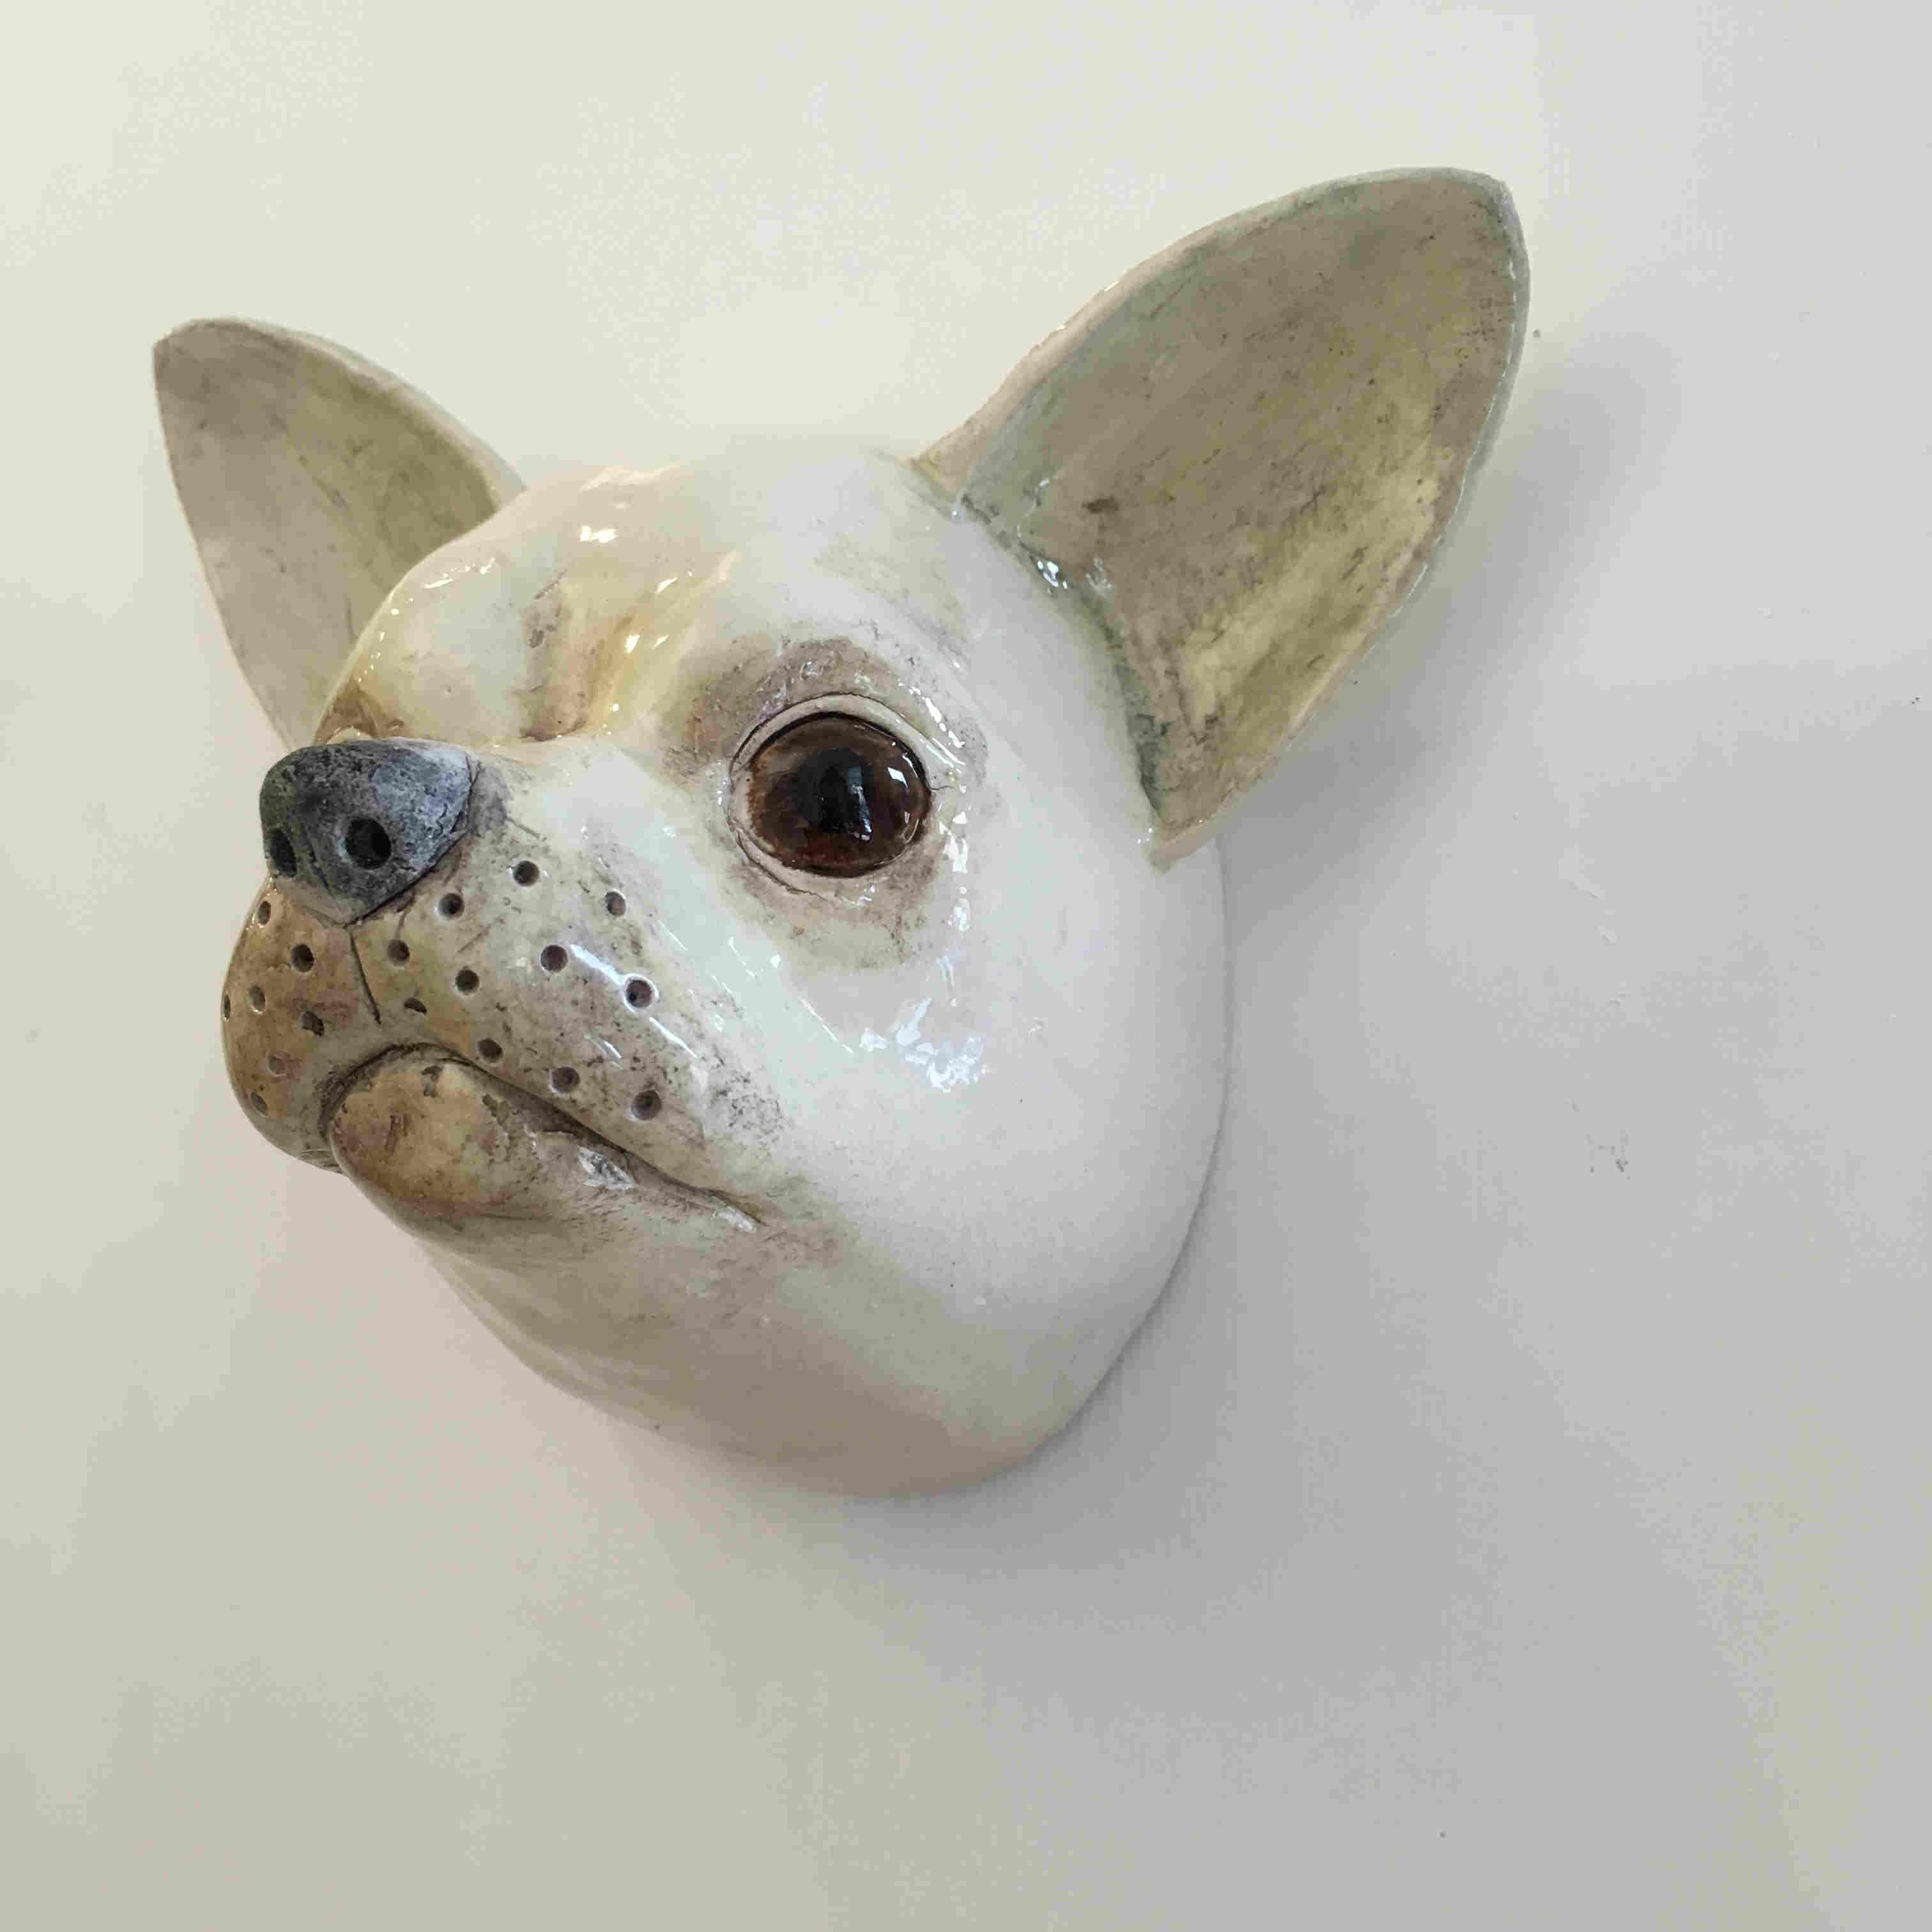 "'Chihuahua ""Bruiser""' by artist Alex Johannsen"